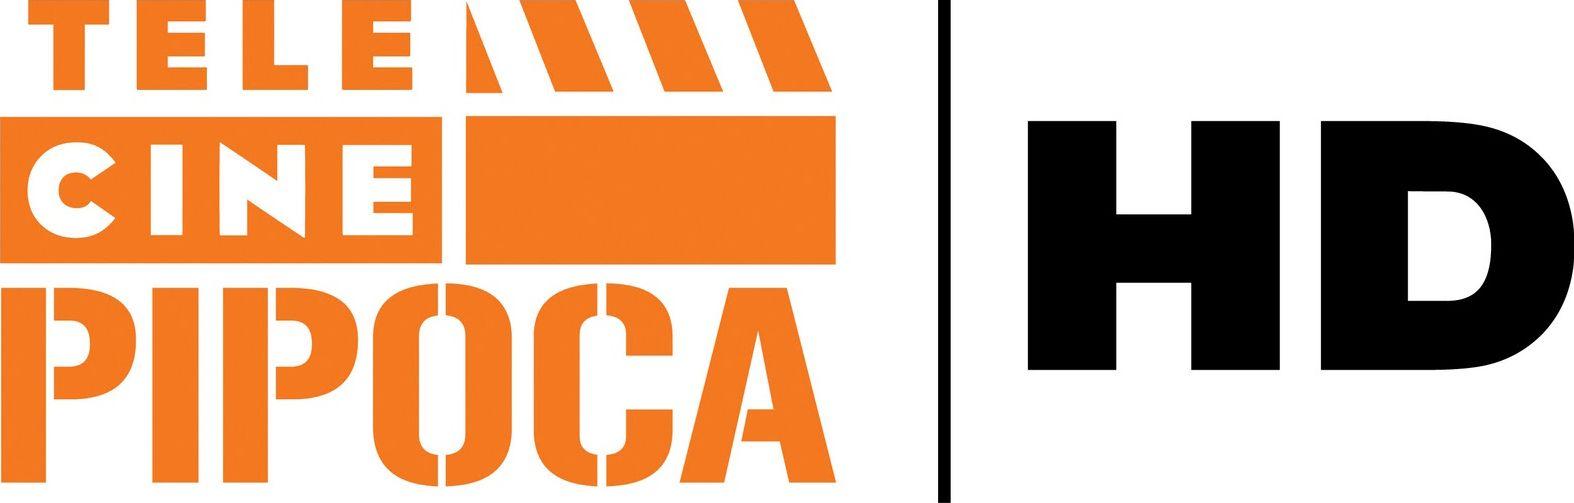 Telecine Pipoca Hd Logotipo